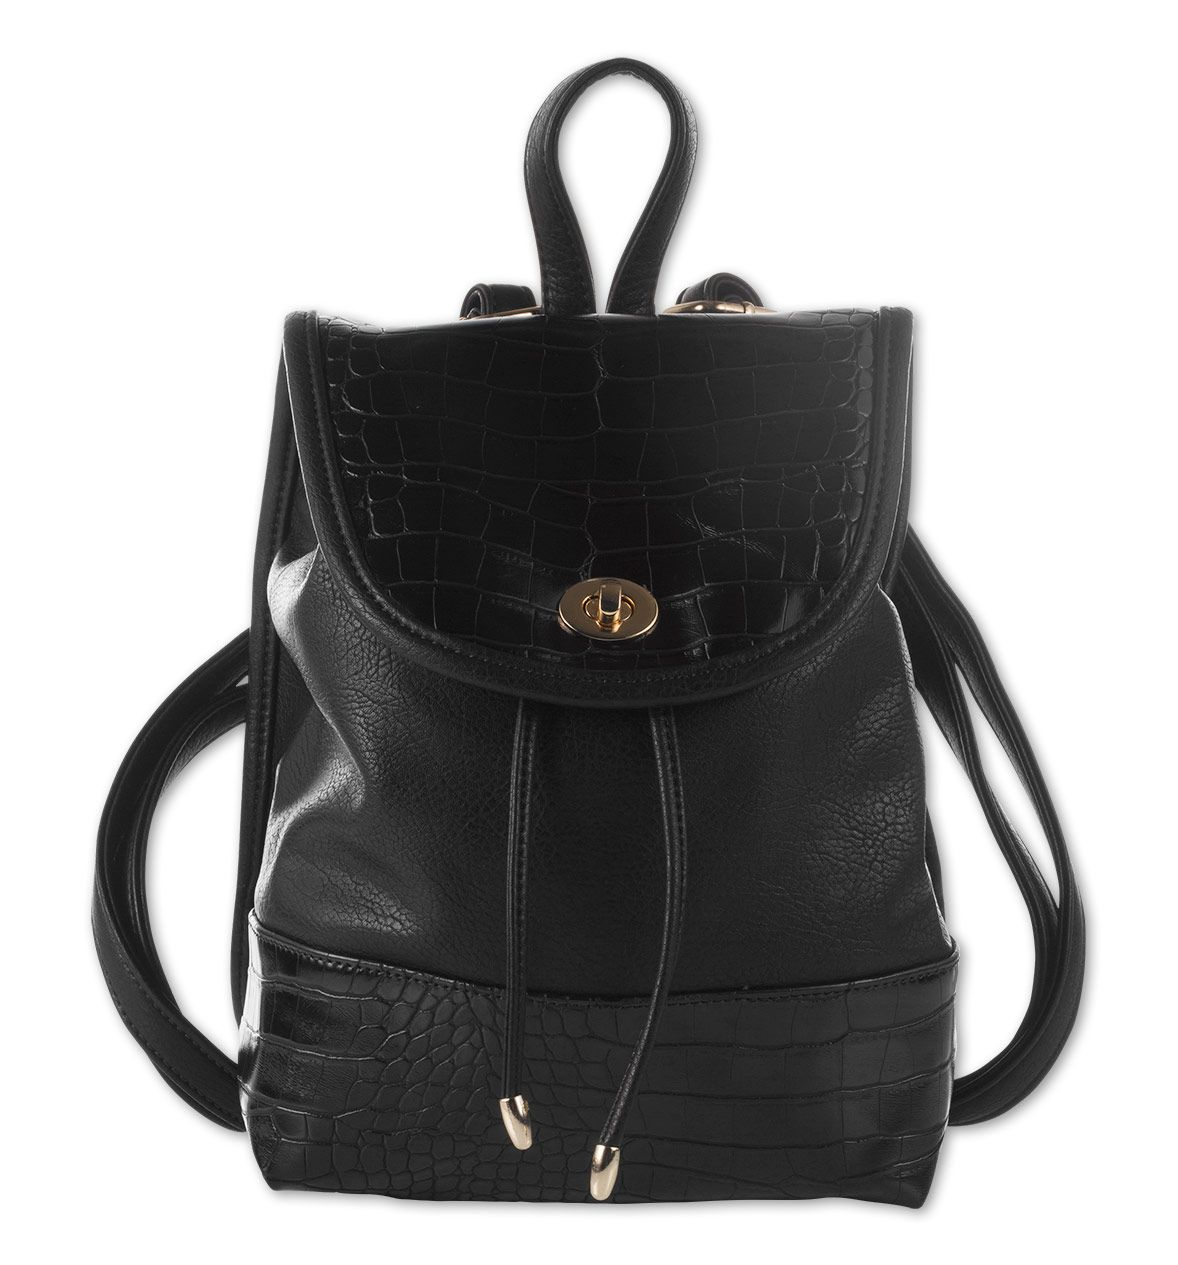 Damen Rucksack In Schwarz Mode Gunstig Online Kaufen C A Fashion Backpack Fashion Backpacks